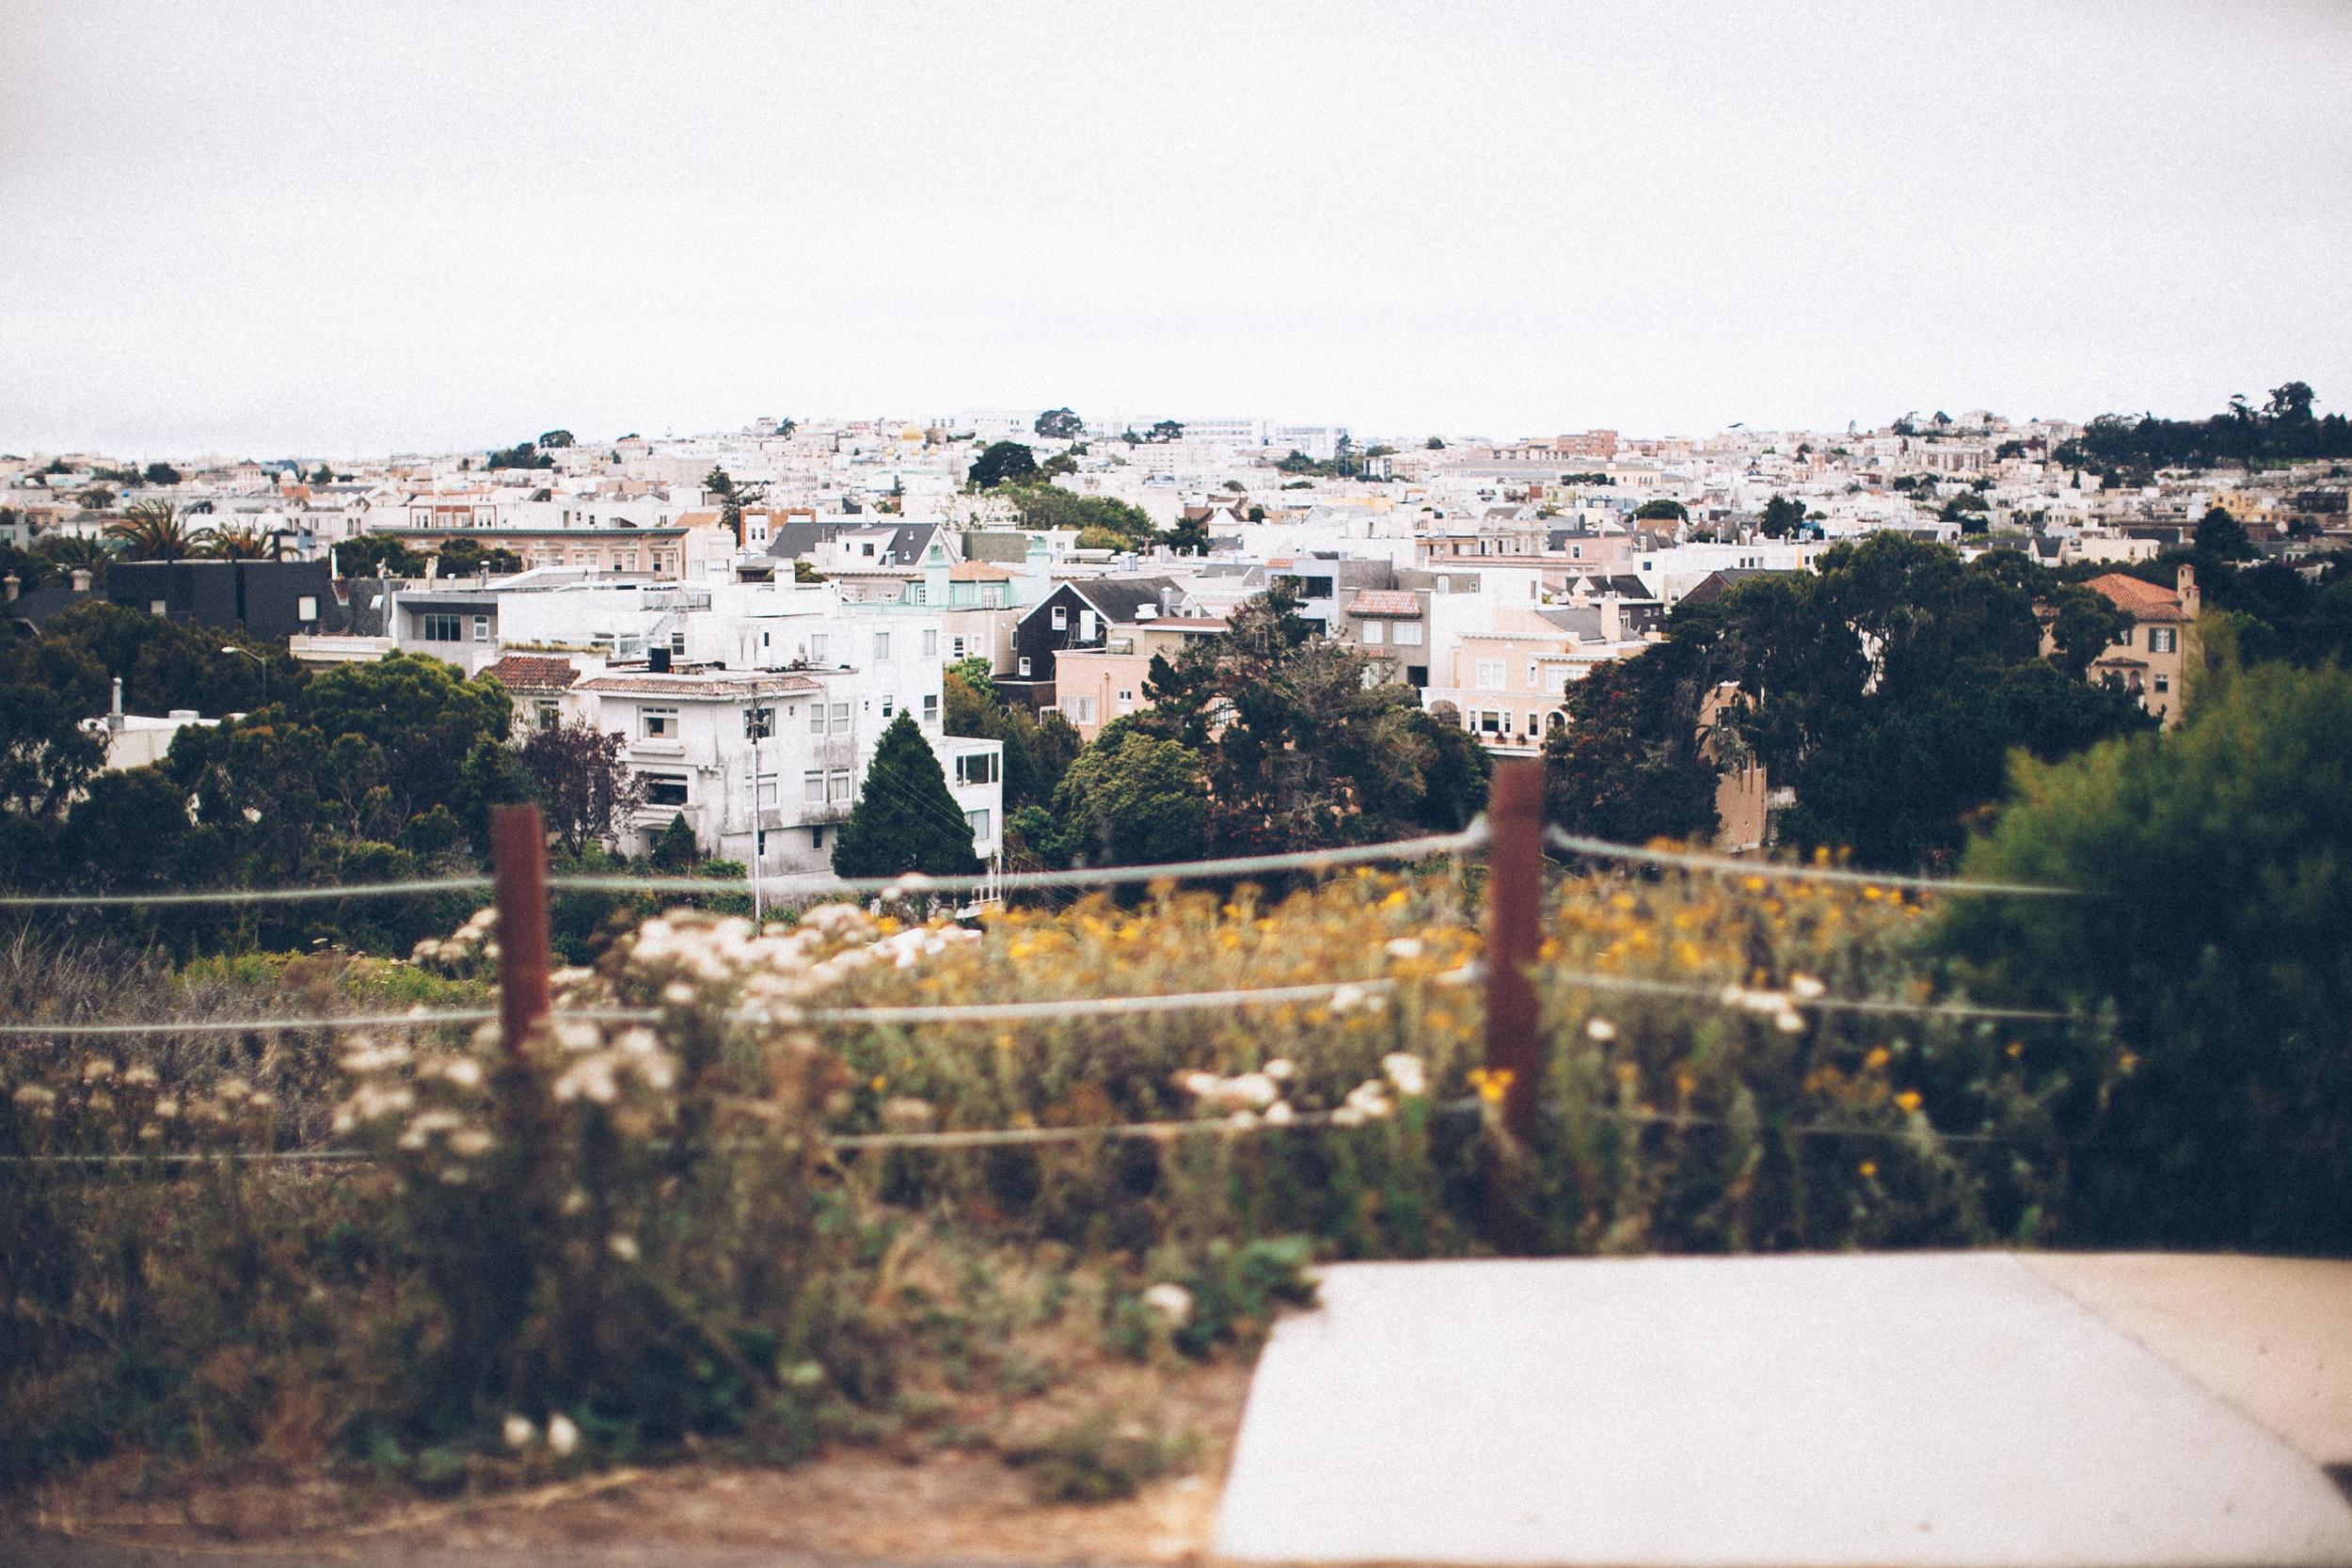 sanfrancisco-1001.jpg